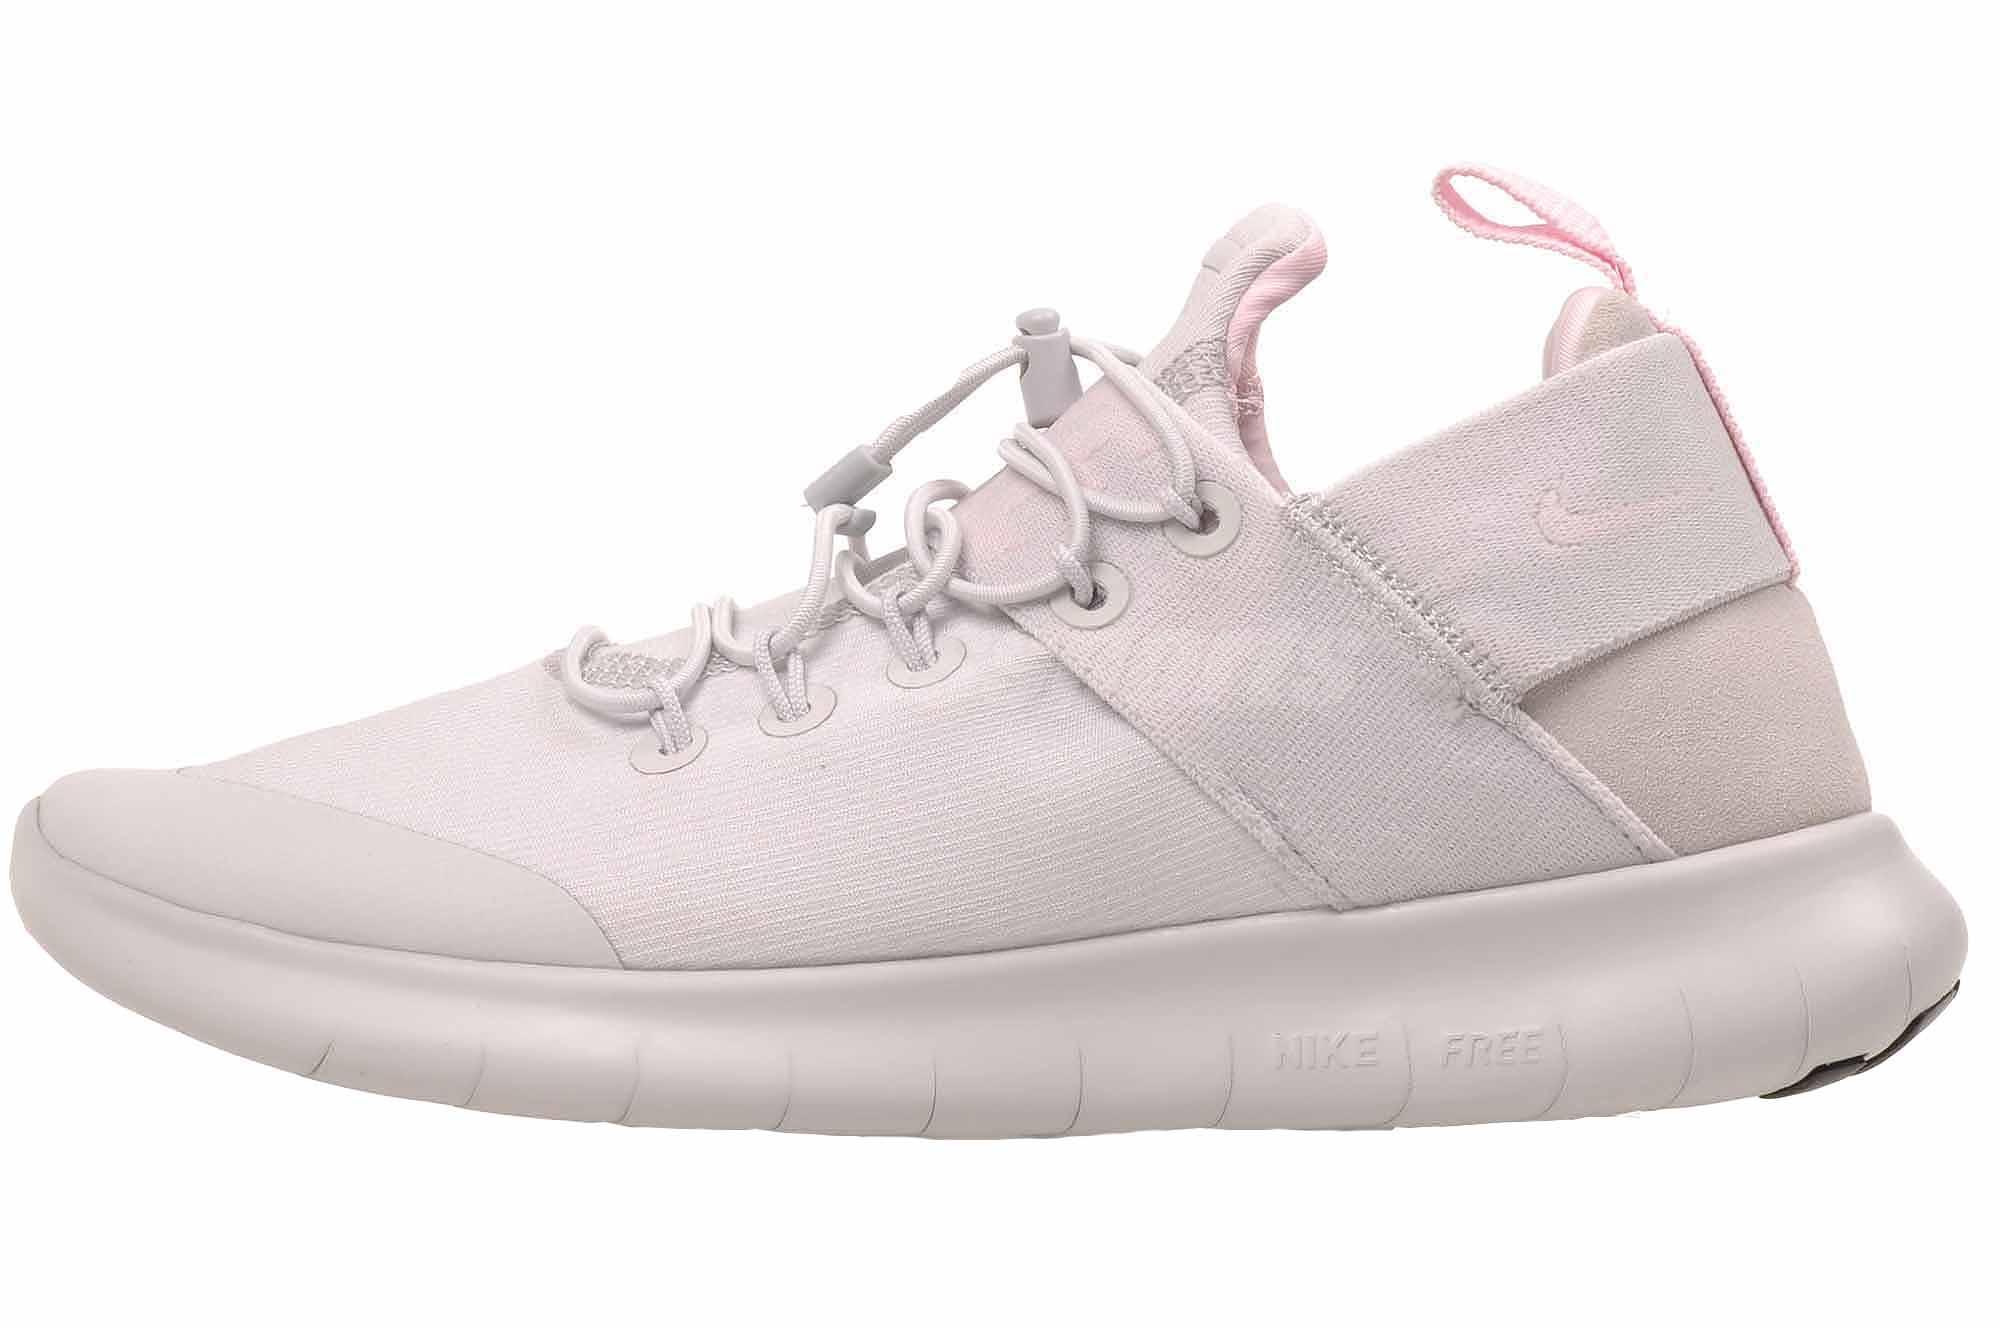 97c572e76de9 Details about Nike Wmns Free RN CMTR 2017 DX Running Womens Shoes Vast Grey  AH8676-001